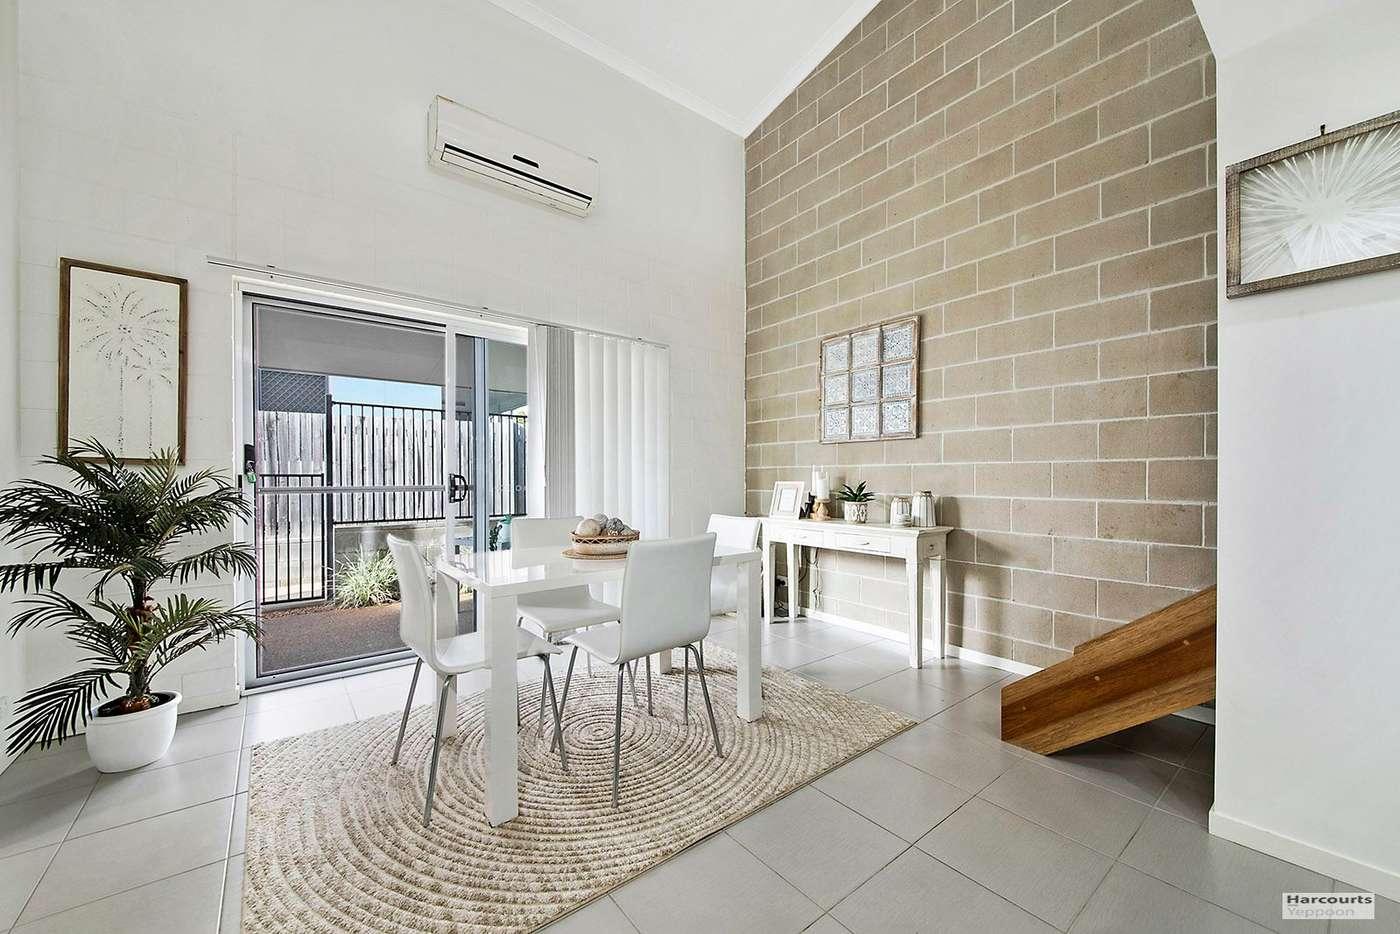 Main view of Homely unit listing, 6/5-7 Birdwood Avenue, Yeppoon QLD 4703